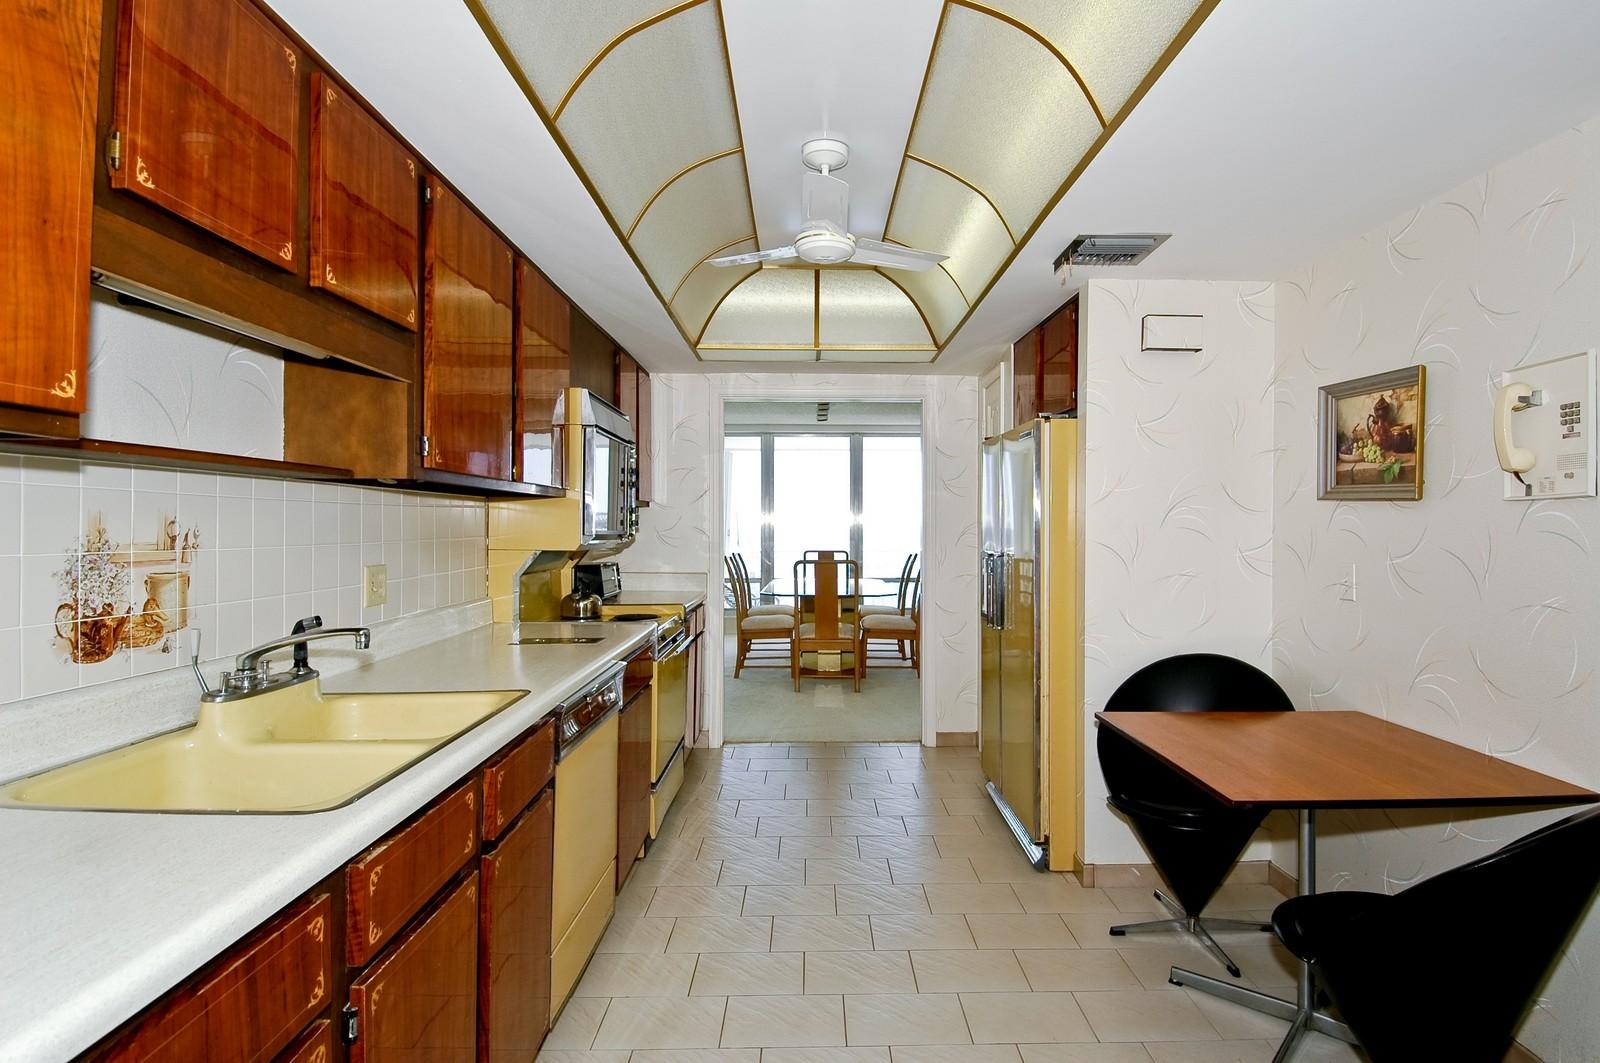 Real Estate Photography - 2200 S Ocean Ln, 206, Fort Lauderdale, FL, 33316 - Kitchen